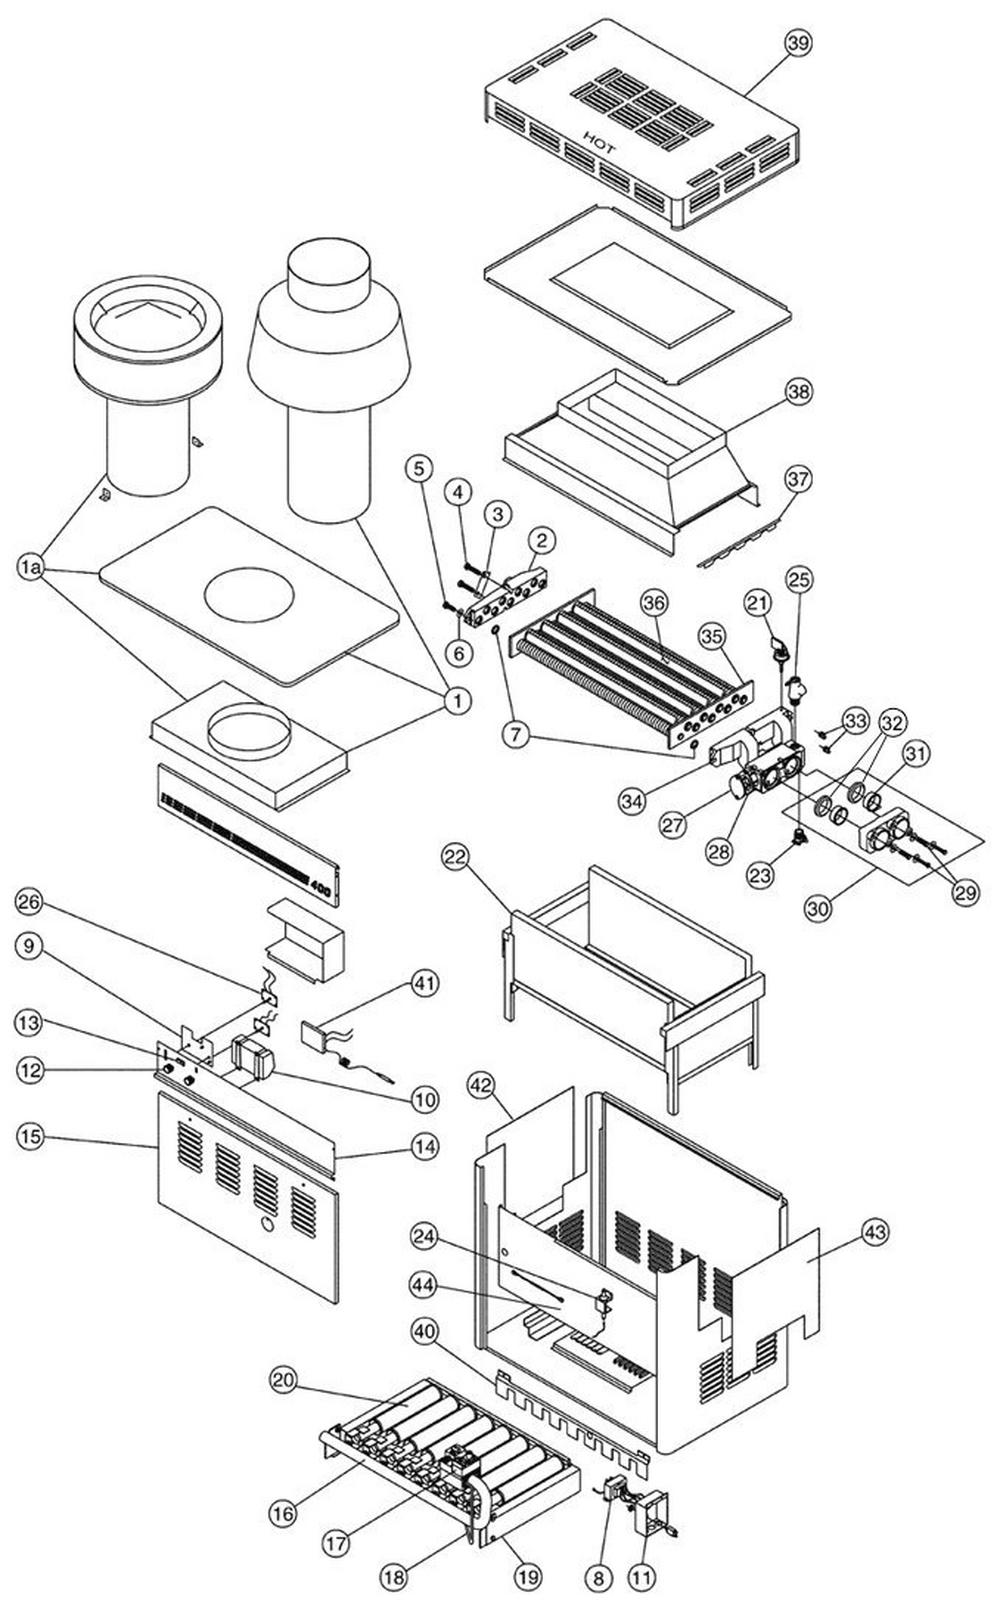 Purex Minimax Plus Heater Page 2 image